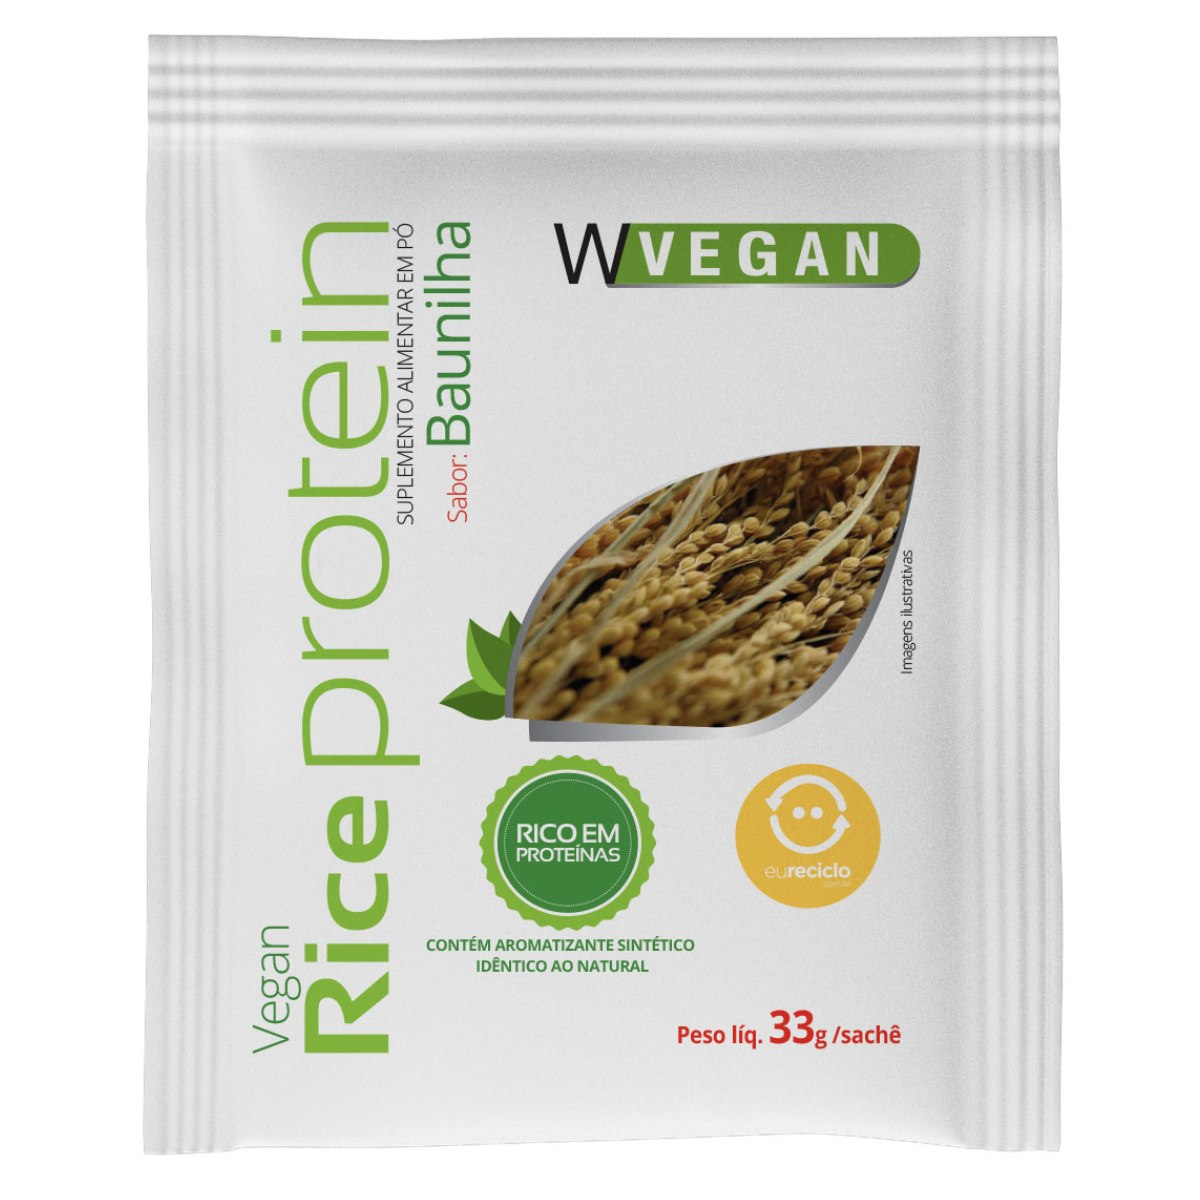 Rice Protein Sache Baunilha 33g WVegan